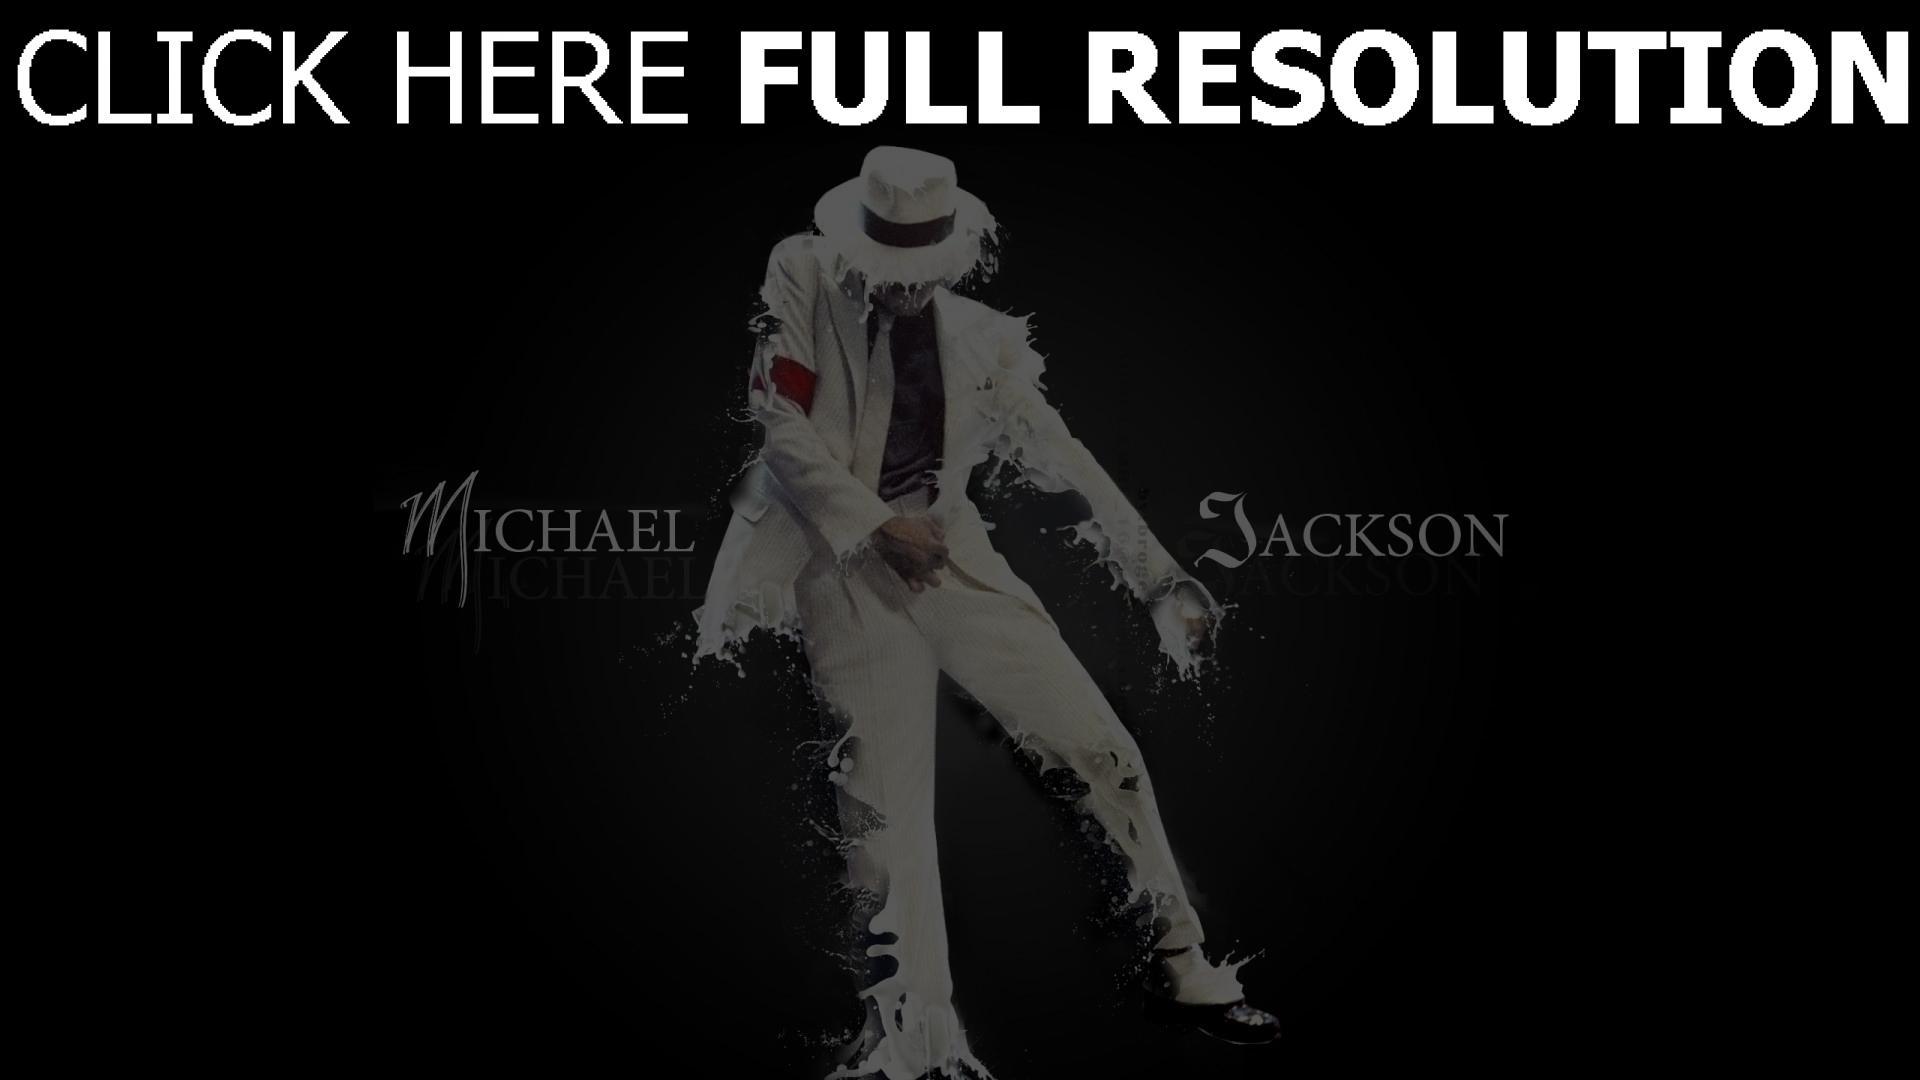 hd hintergrundbilder anzug michael jackson briefe tanz spray 1920x1080